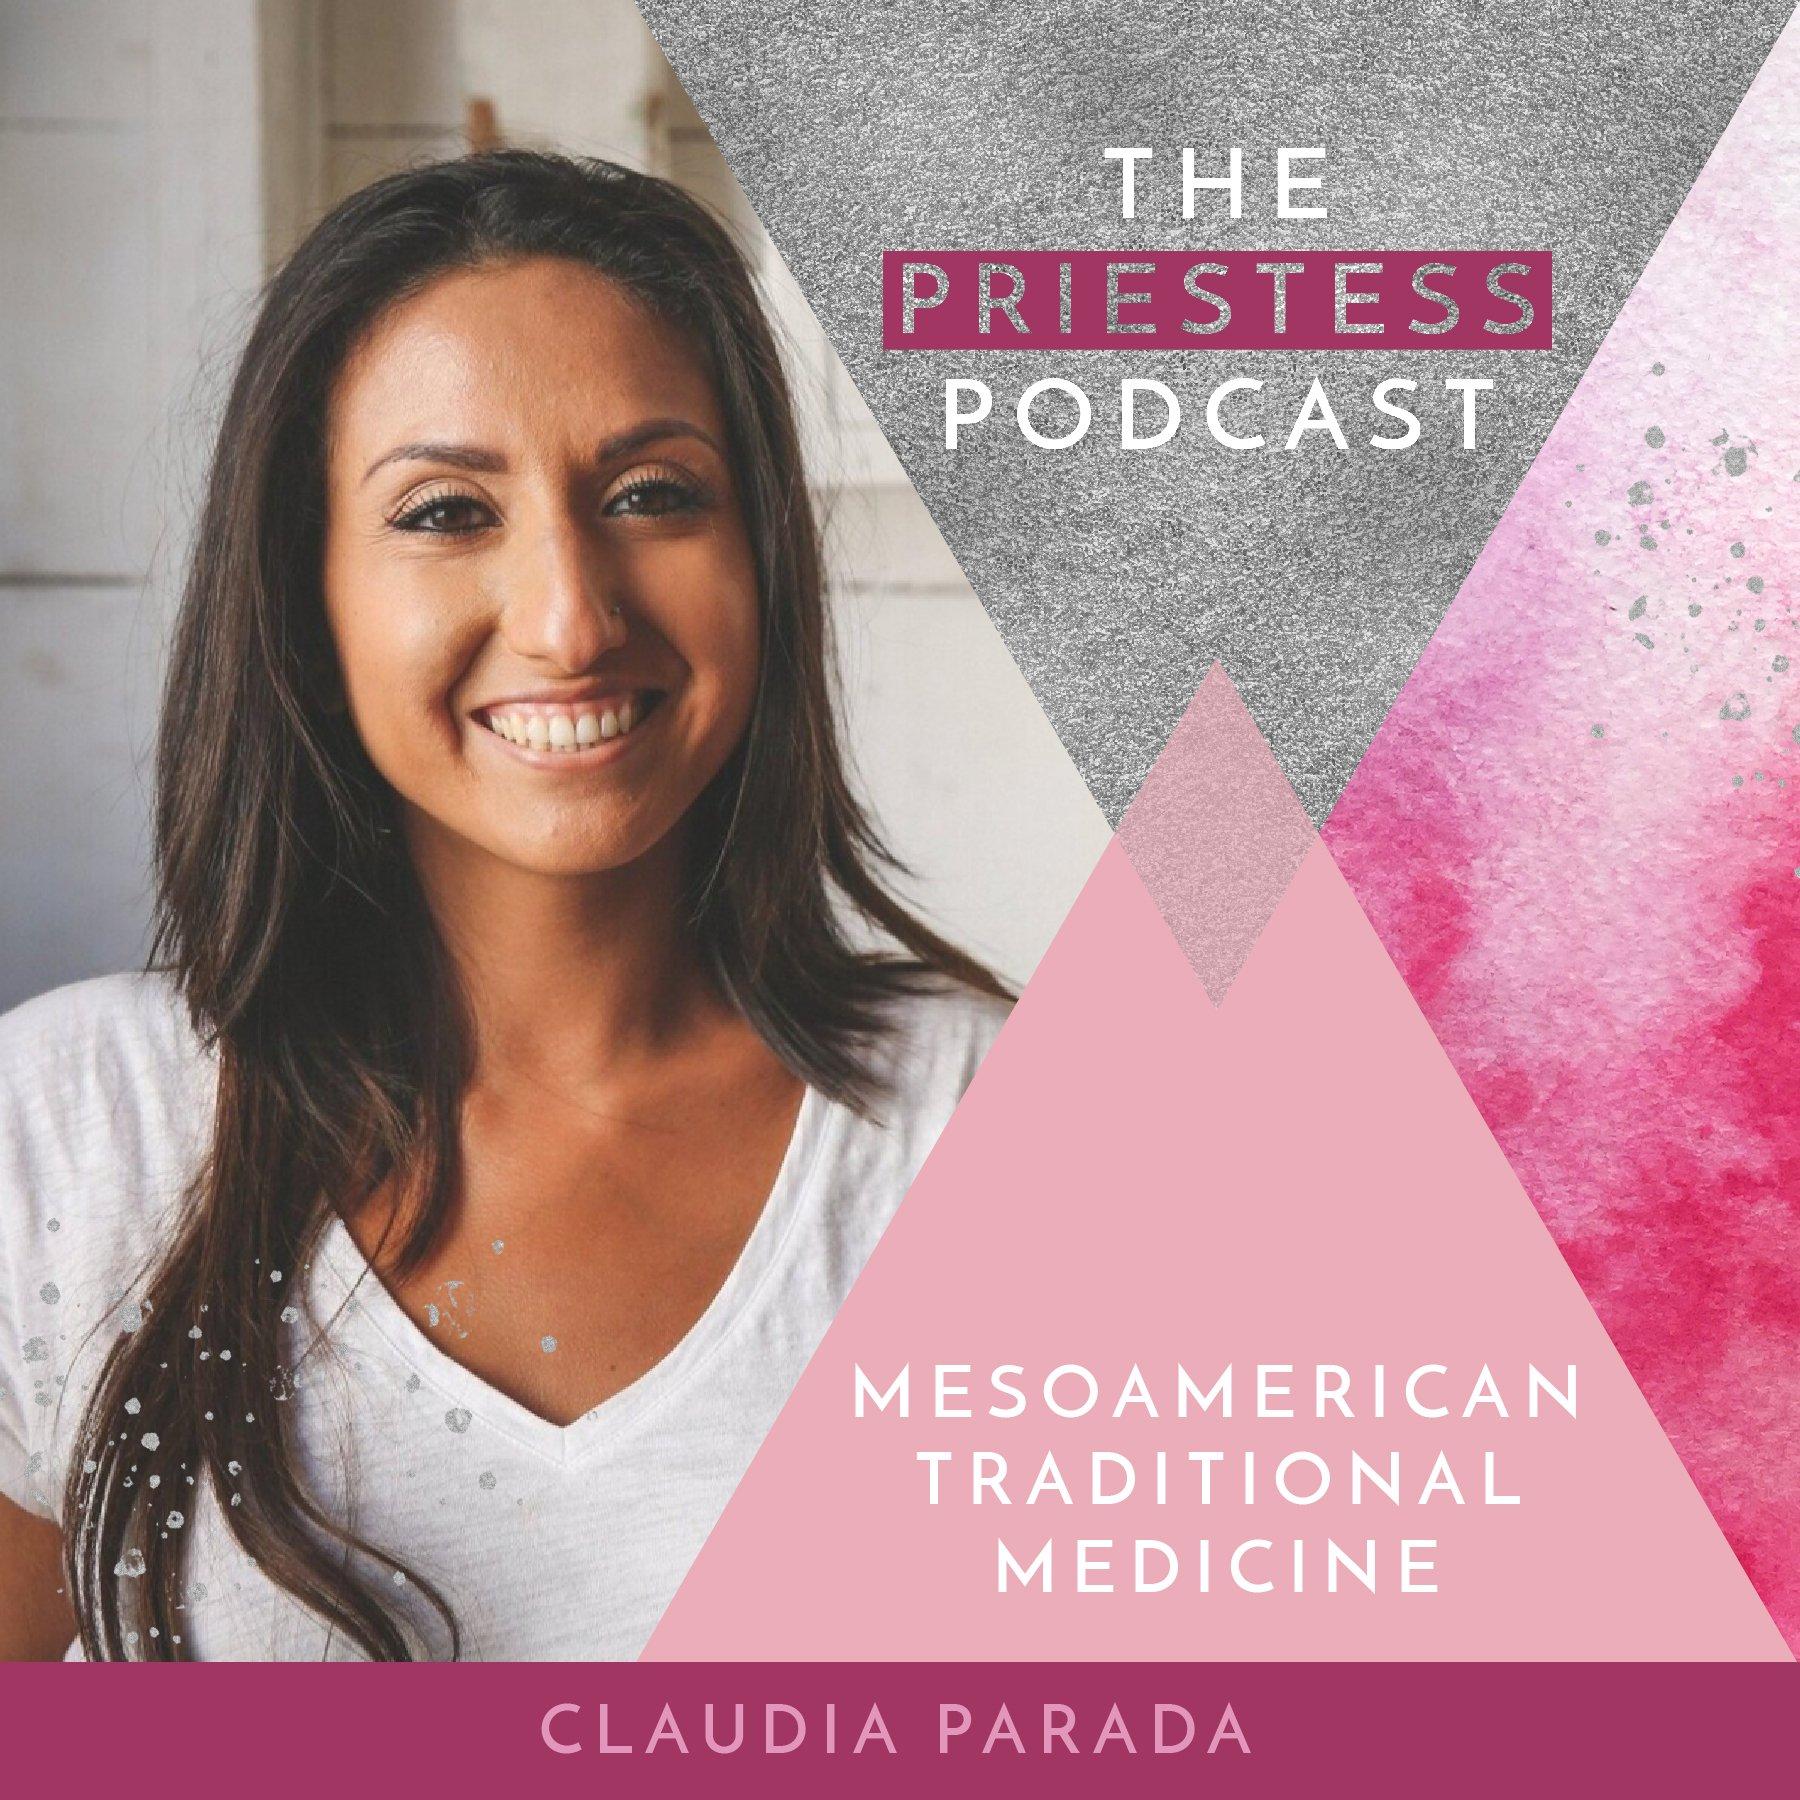 Claudia Parada on Mesoamerican Traditional Medicine